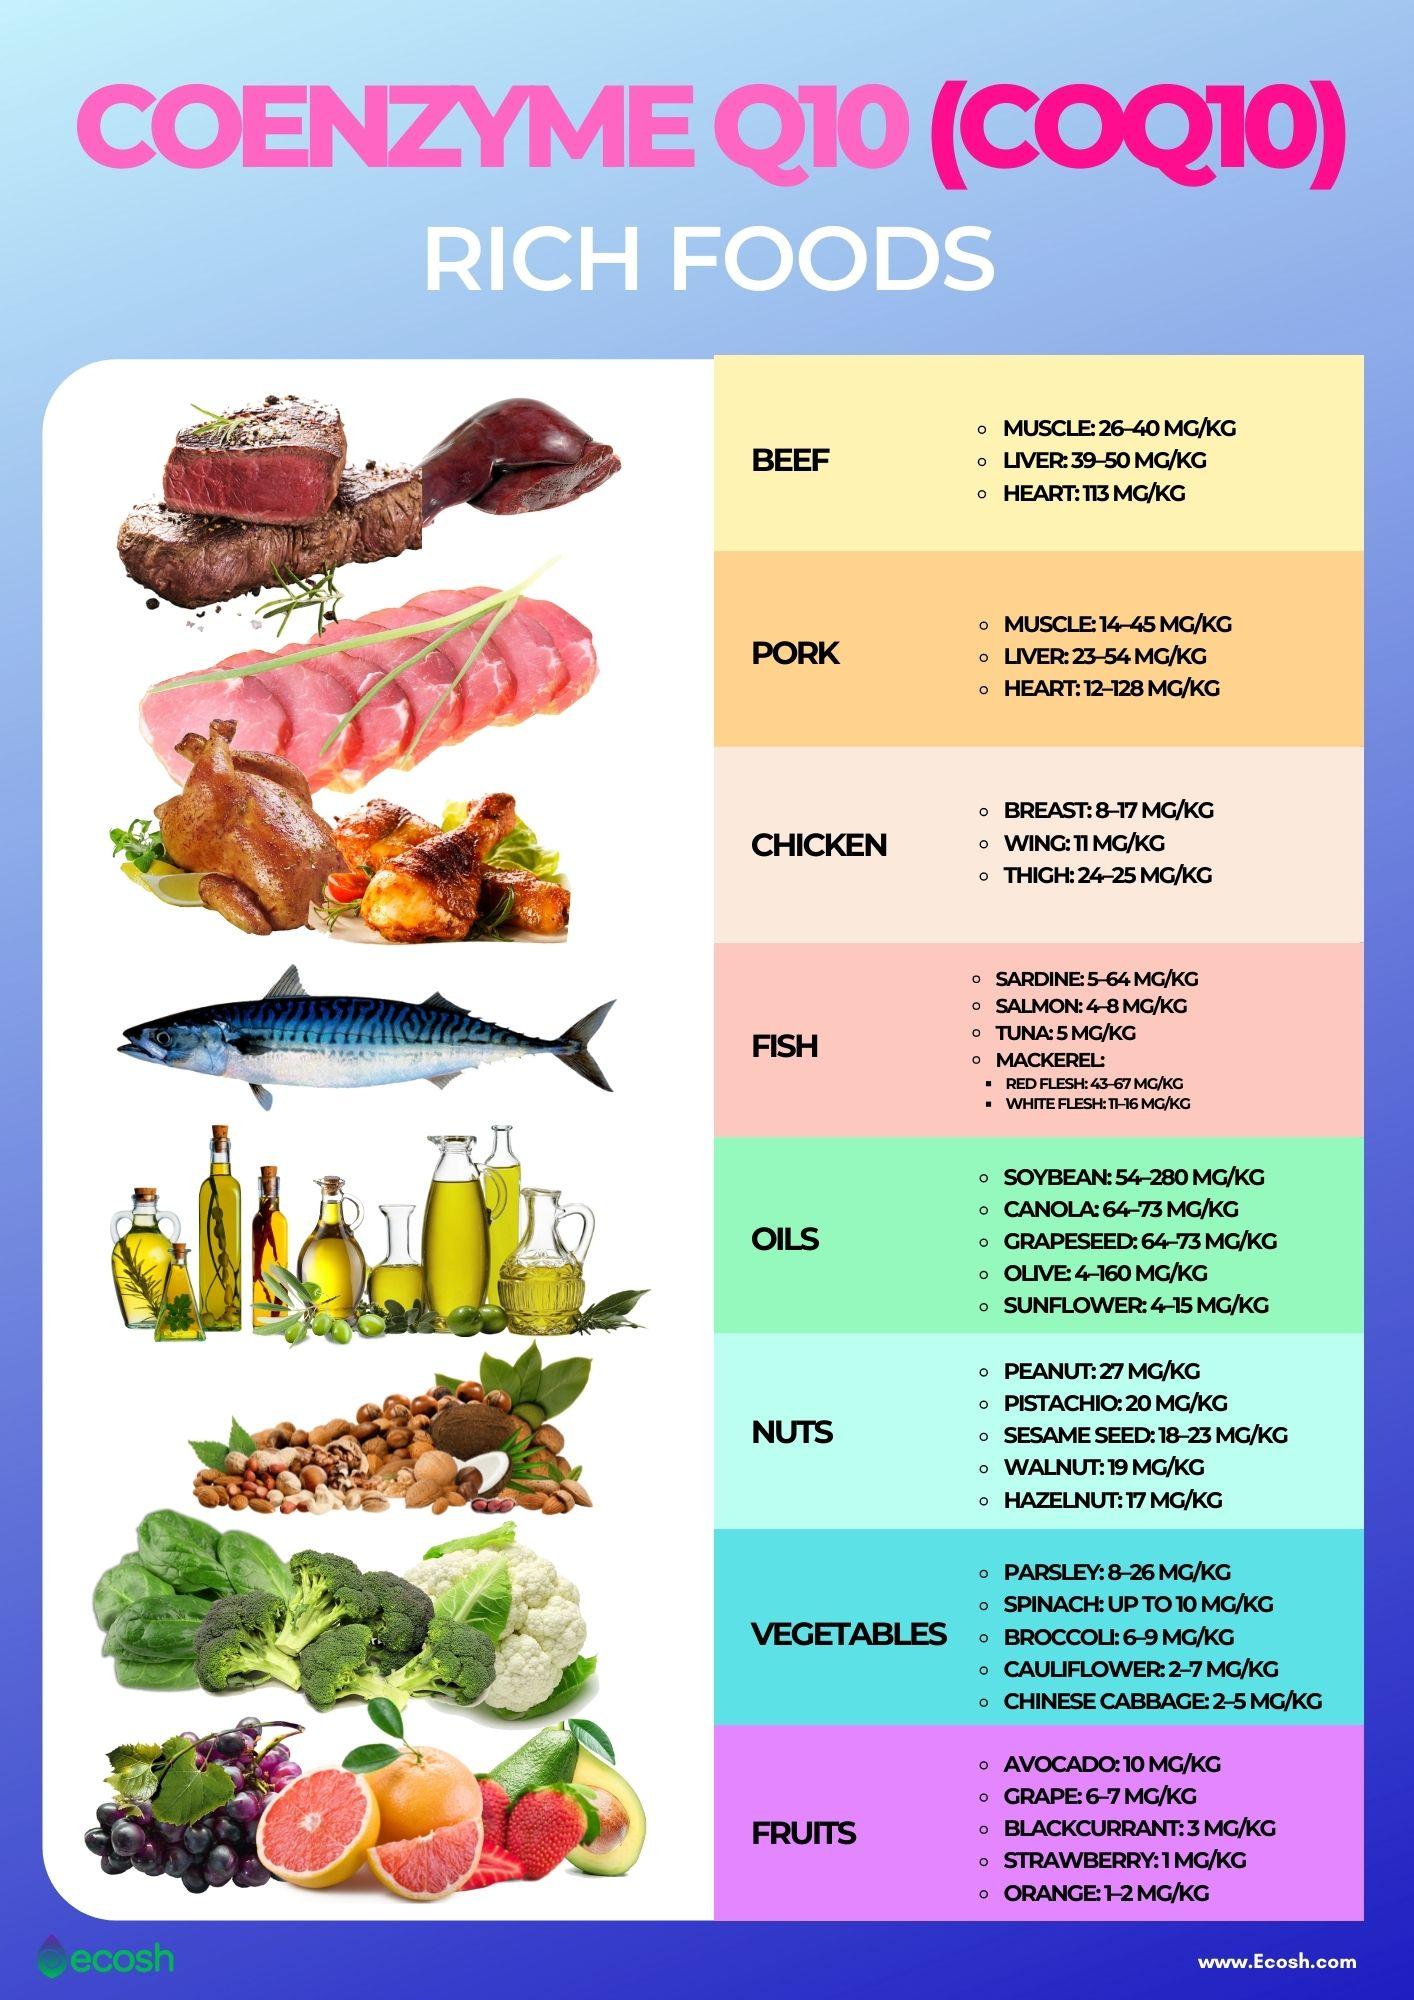 Ecosh_Coenzyme_Q10_COQ10_Rich_Foods_CoQ10_Cotent_in_Foods